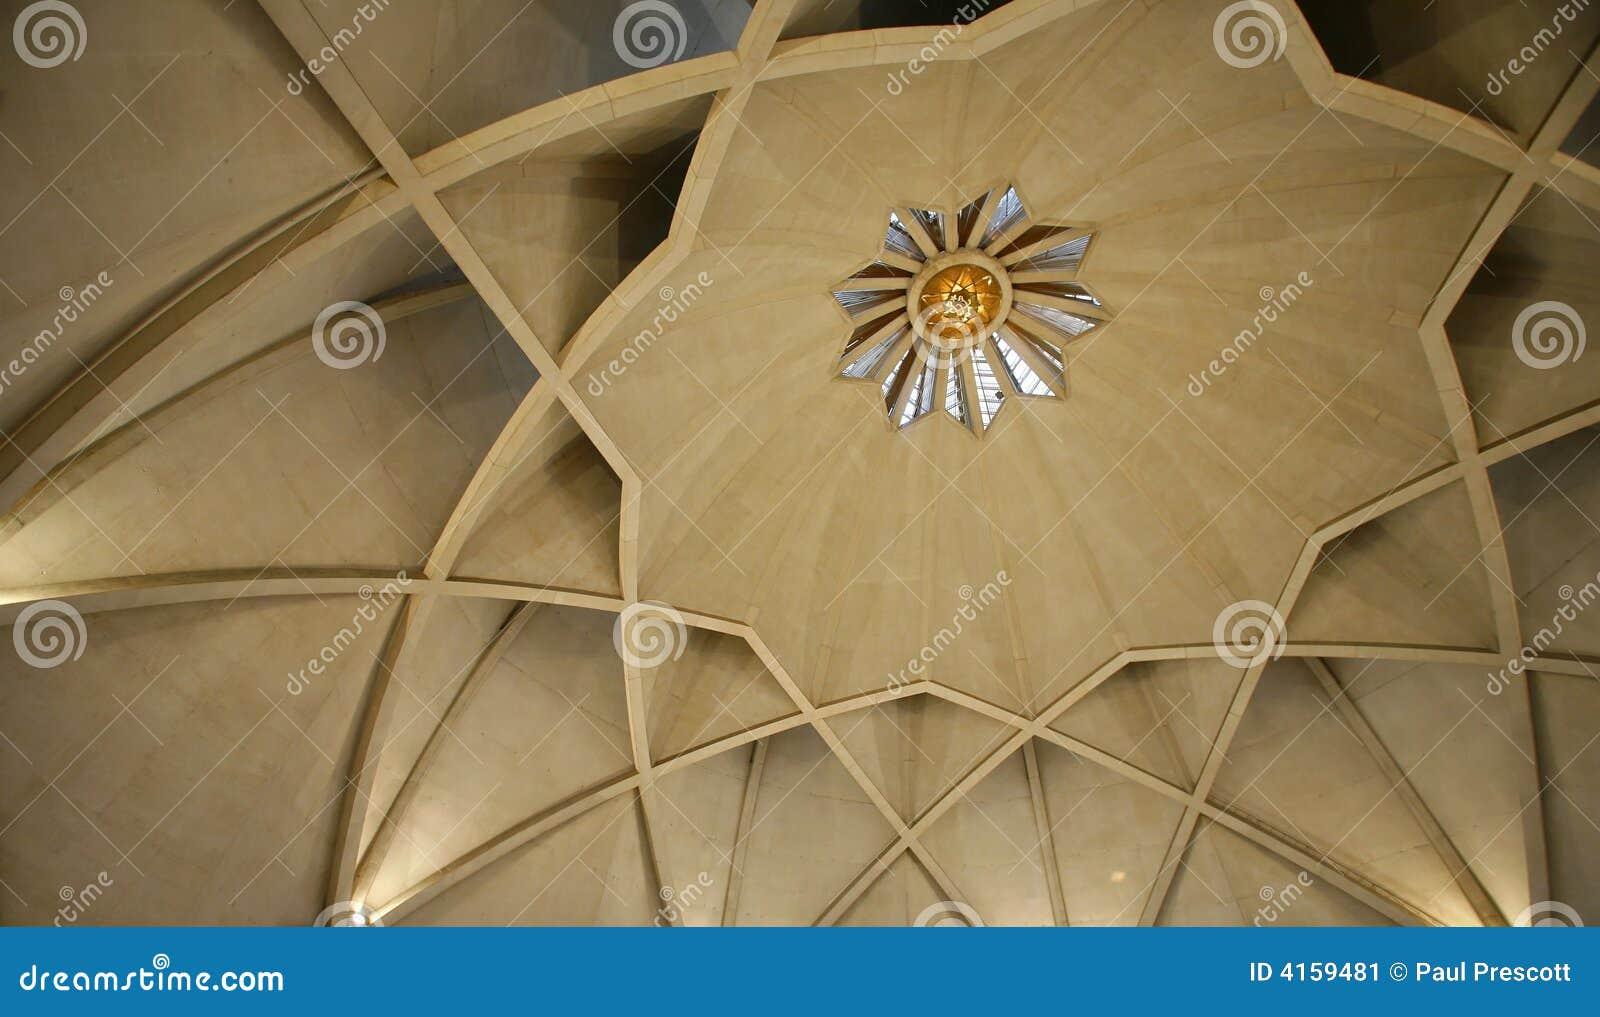 HD wallpapers interior designers in delhi